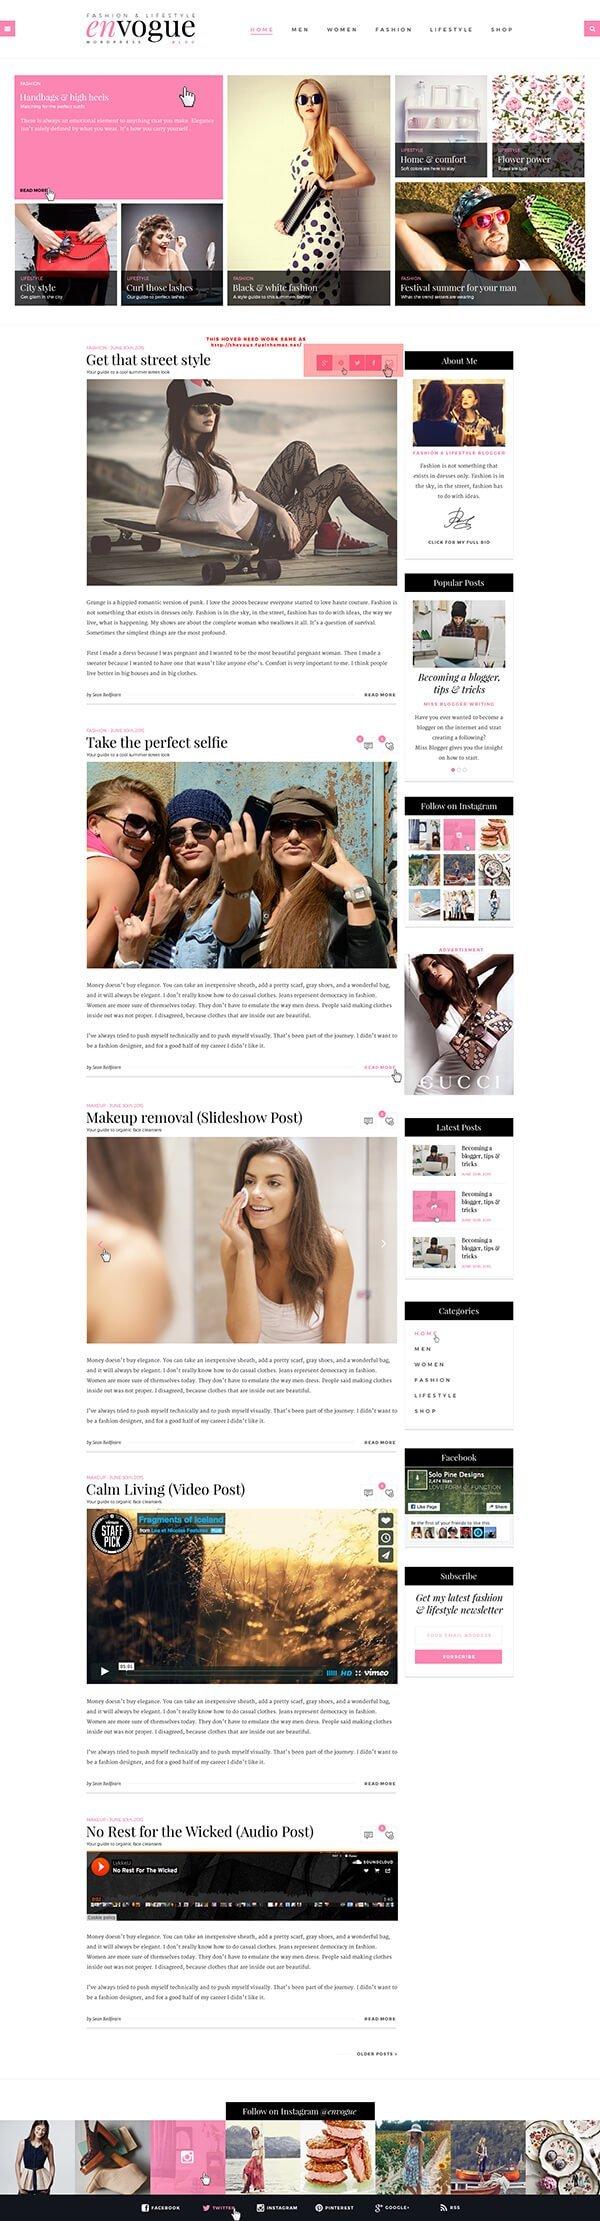 EnVogue | Fashion & Lifestyle Blog WordPress Theme